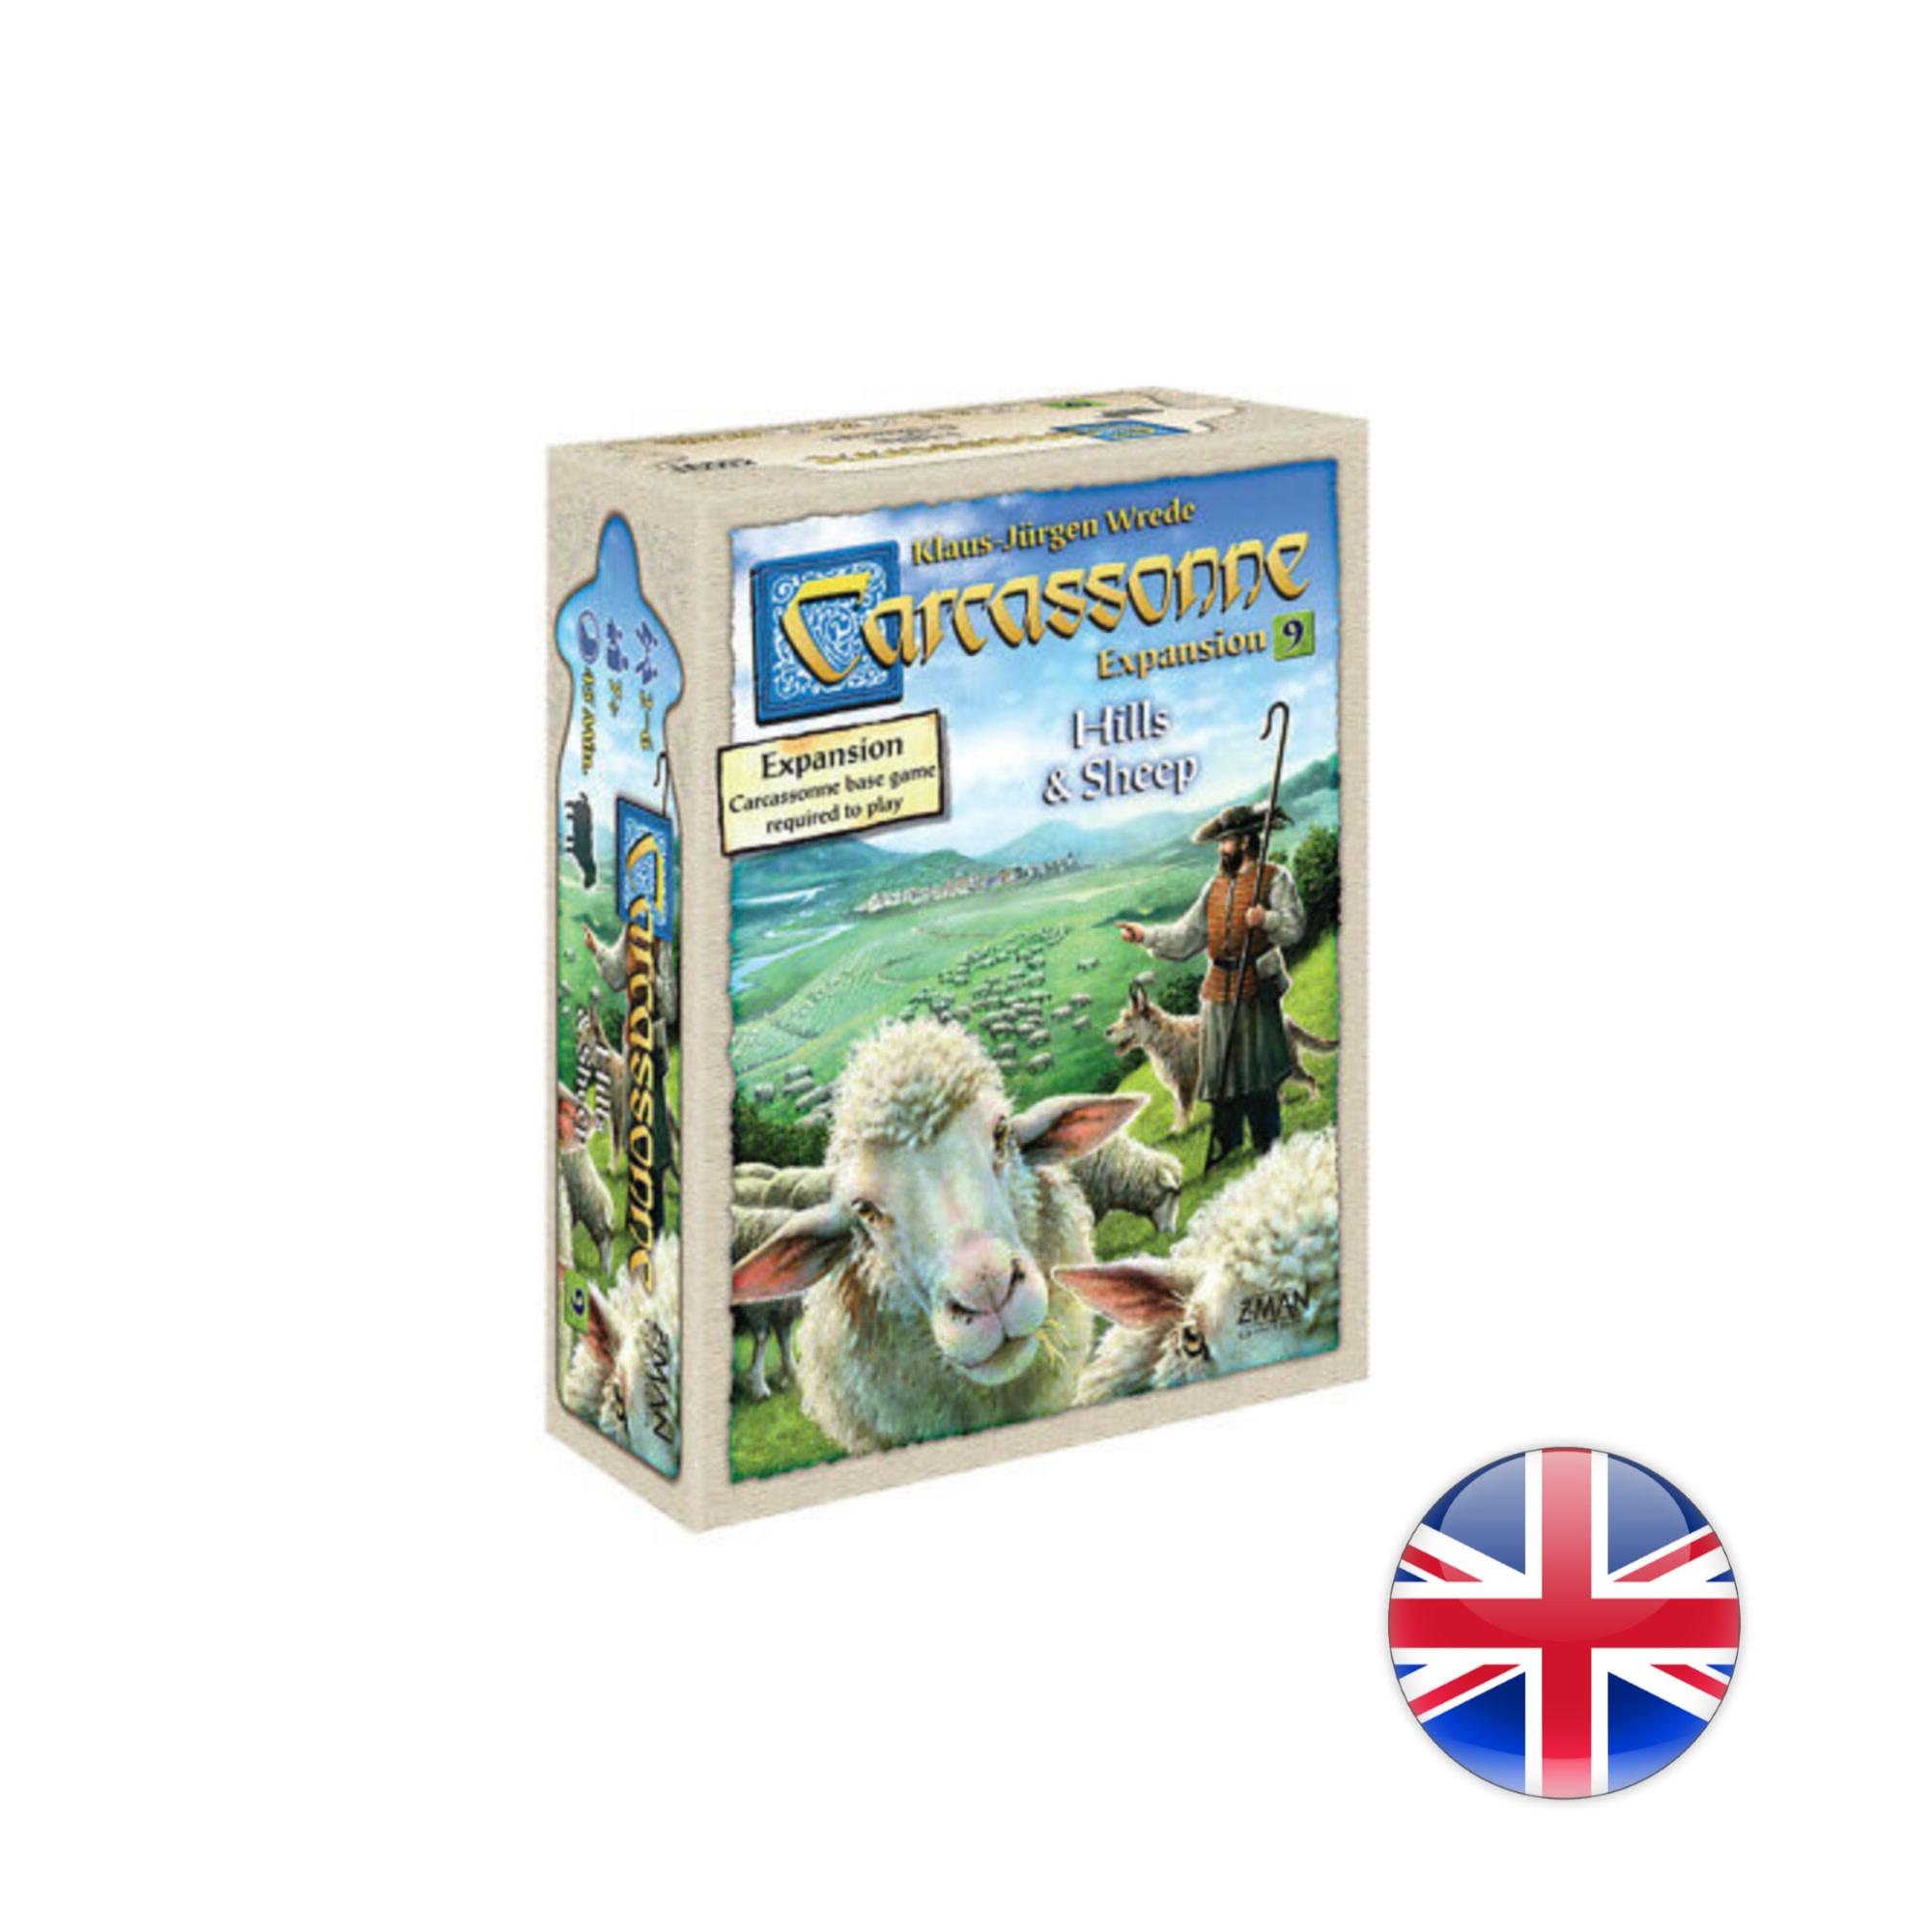 Z-Man Carcassonne Exp : 9 - Hills & Sheep